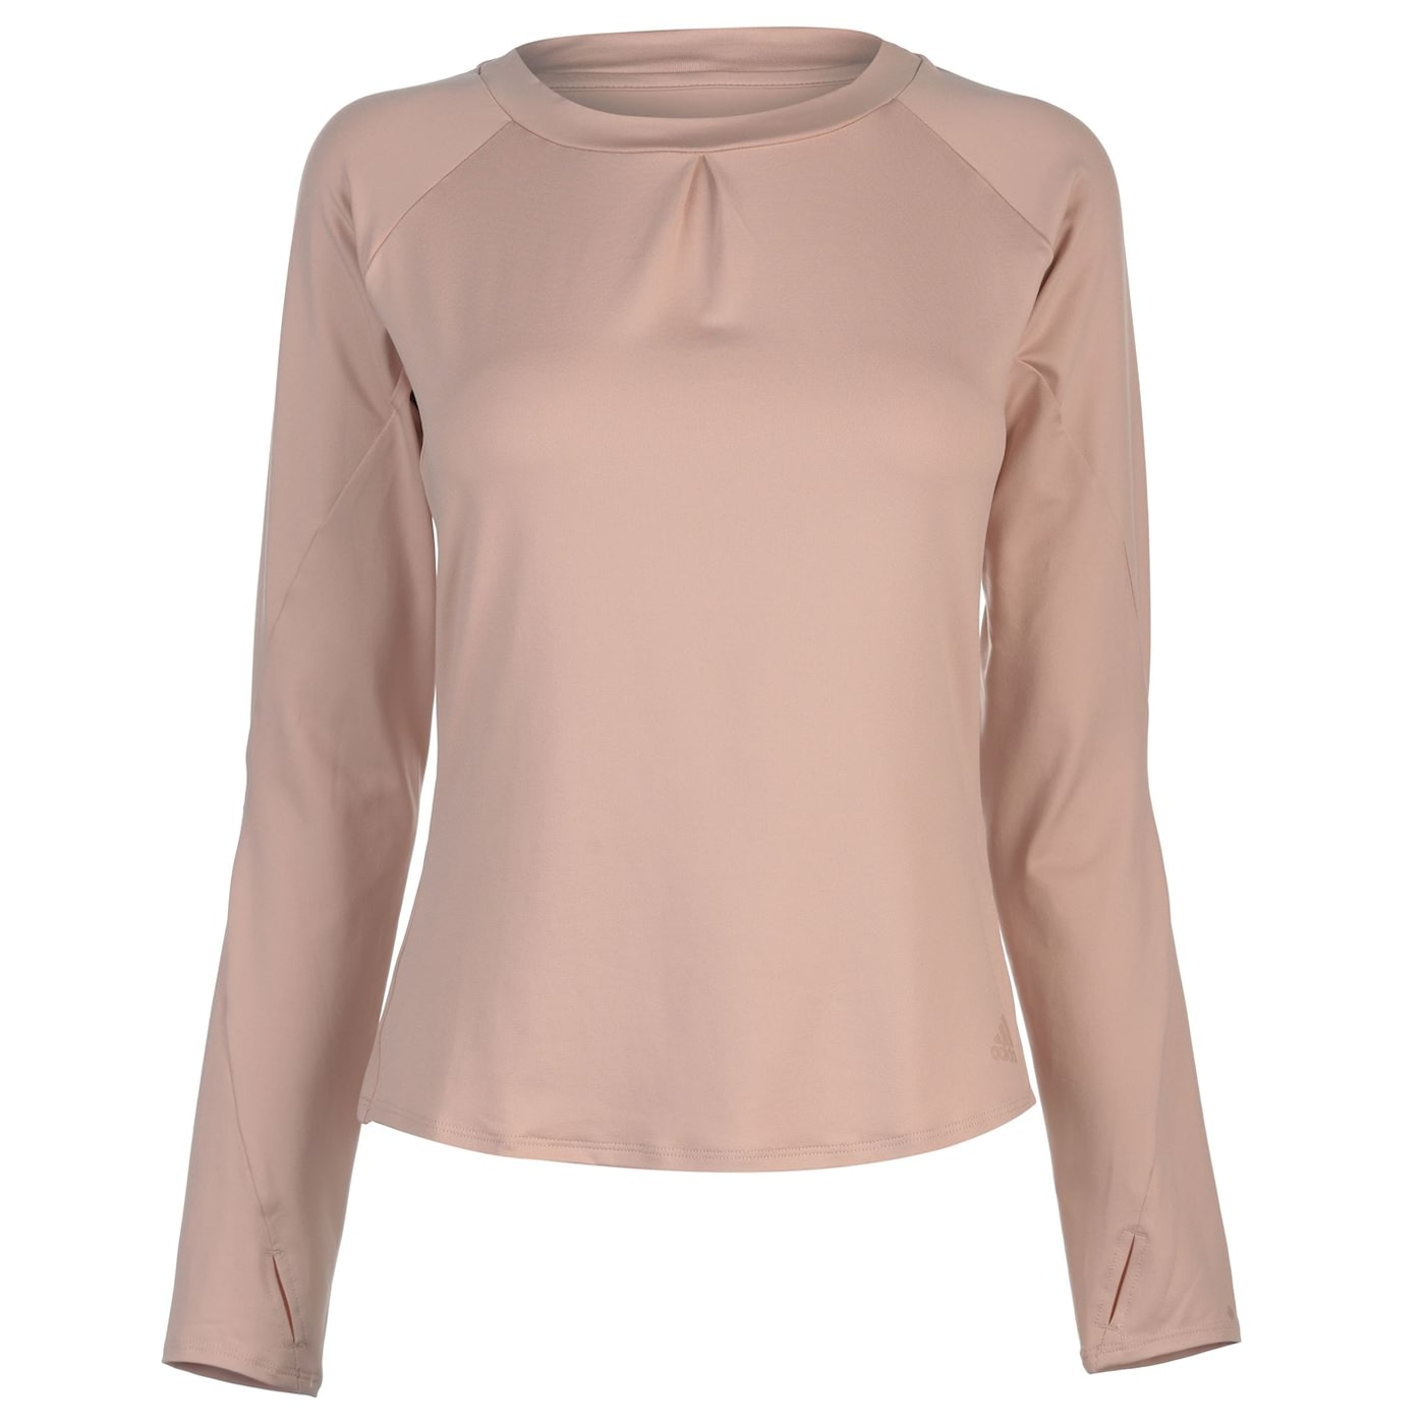 Adidas TKO Long Sleeve T Shirt Ladies